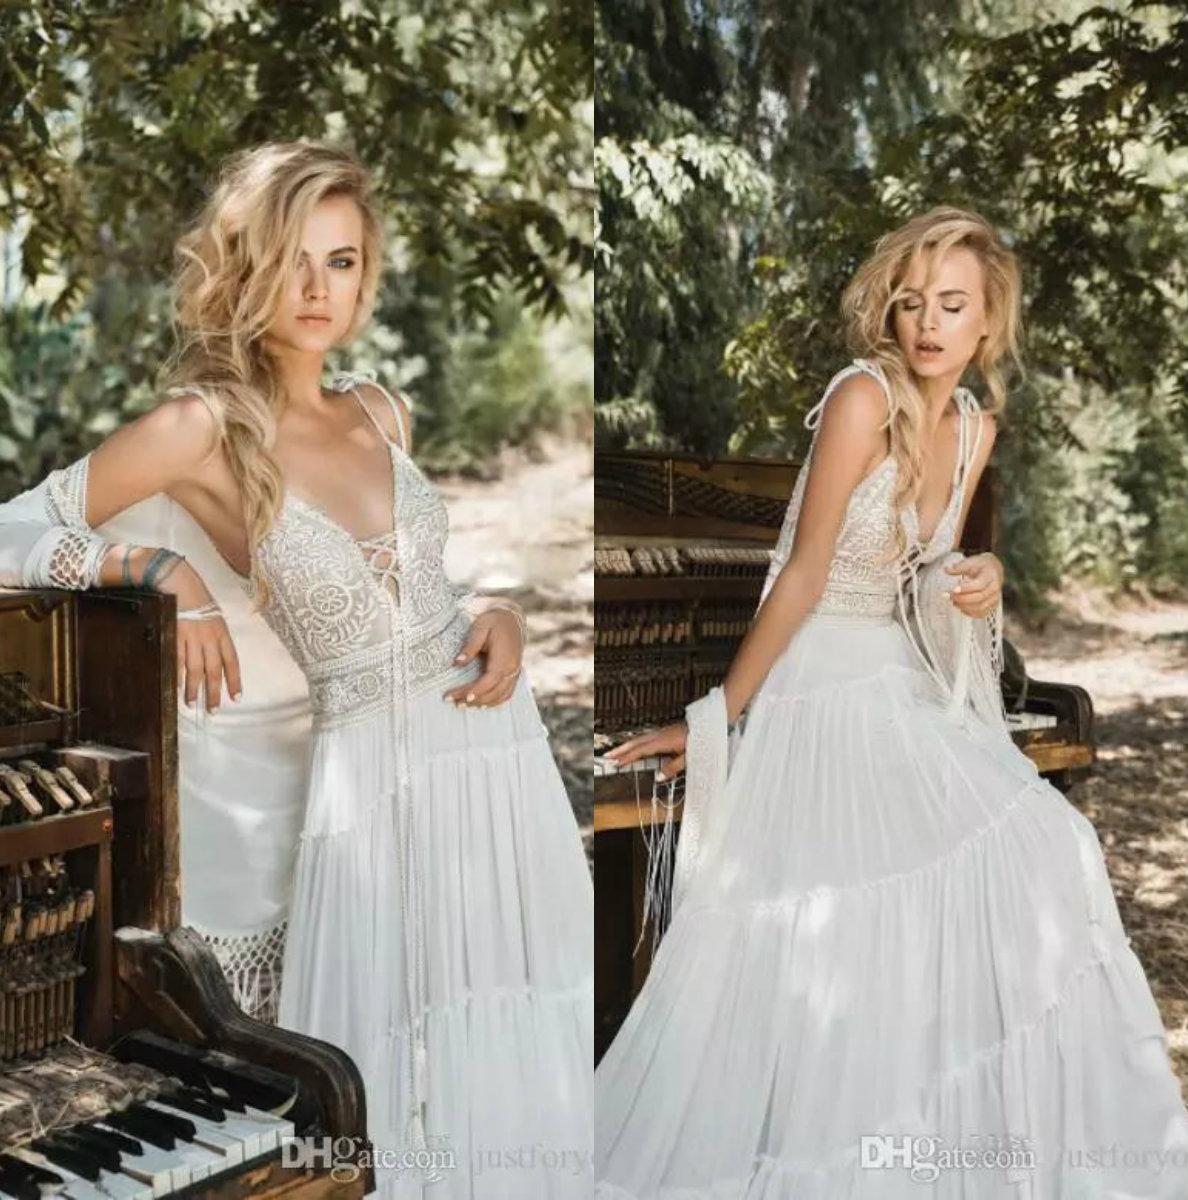 Discount Vintage Crochet Wedding Dress Vintage Crochet Wedding Dress 2020 On Sale At Dhgate Com